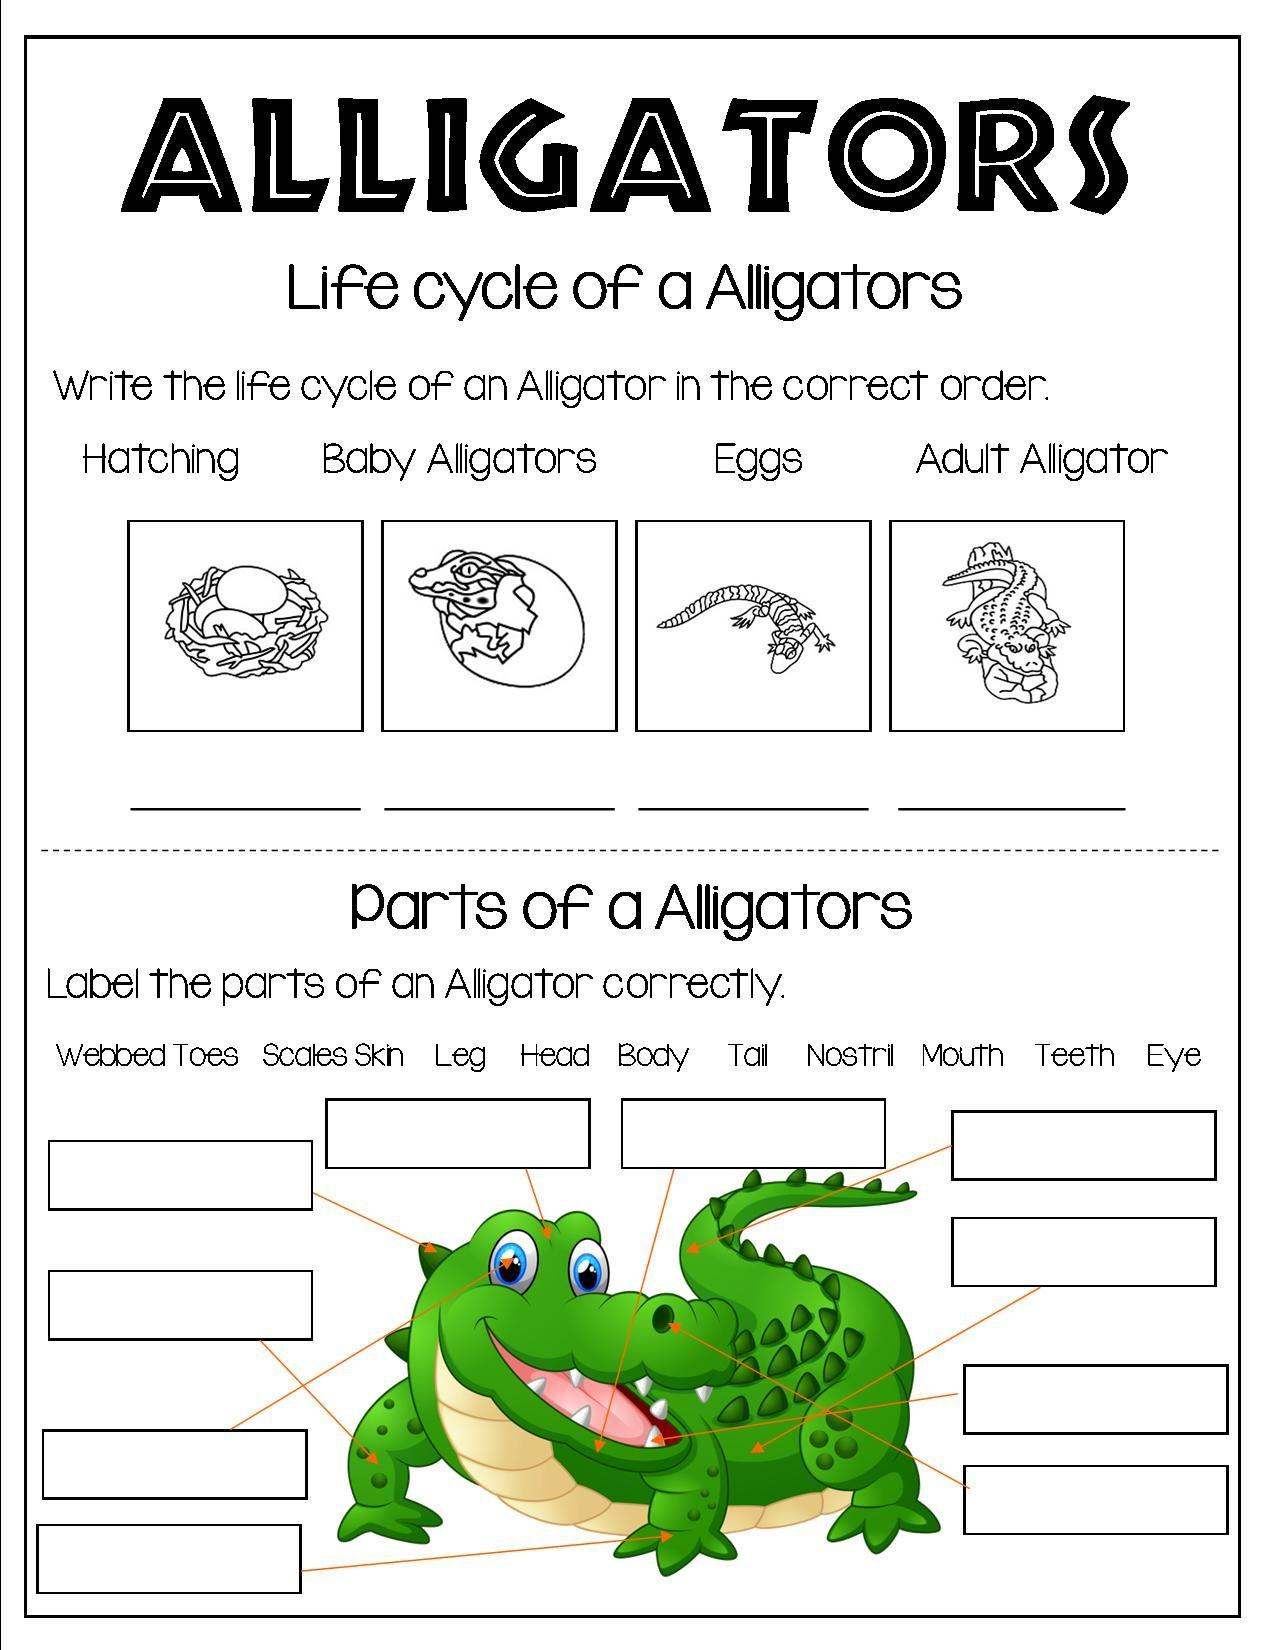 All About Alligators Kindergarten Worksheets Cycle For Kids Kindergarten Social Studies